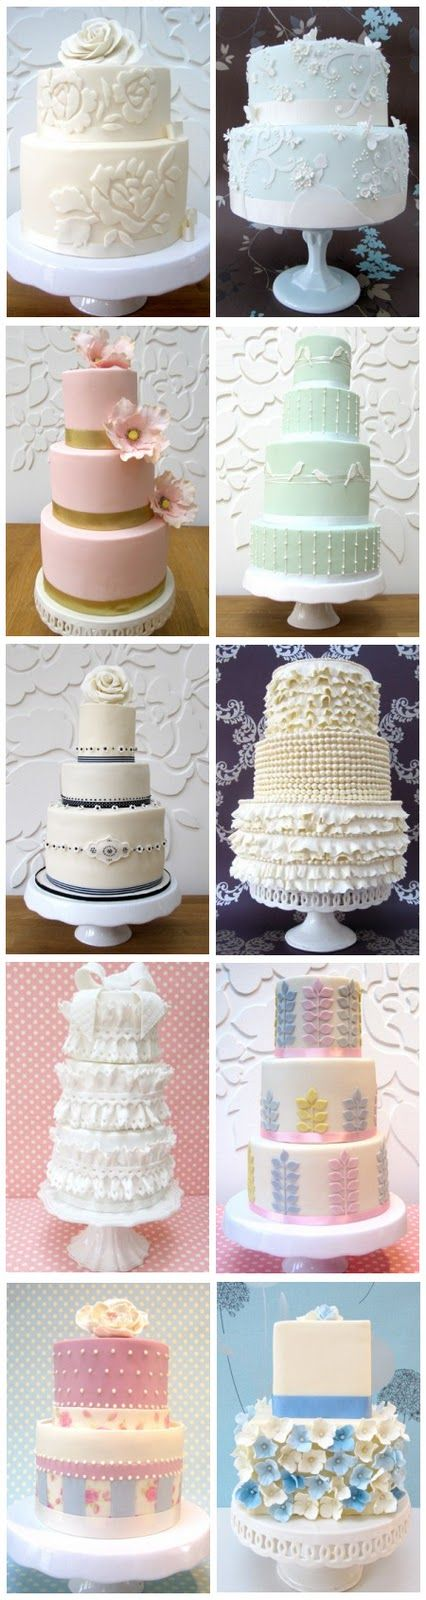 Always Andri Wedding Design Blog: Rosalind Miller Wedding Cakes